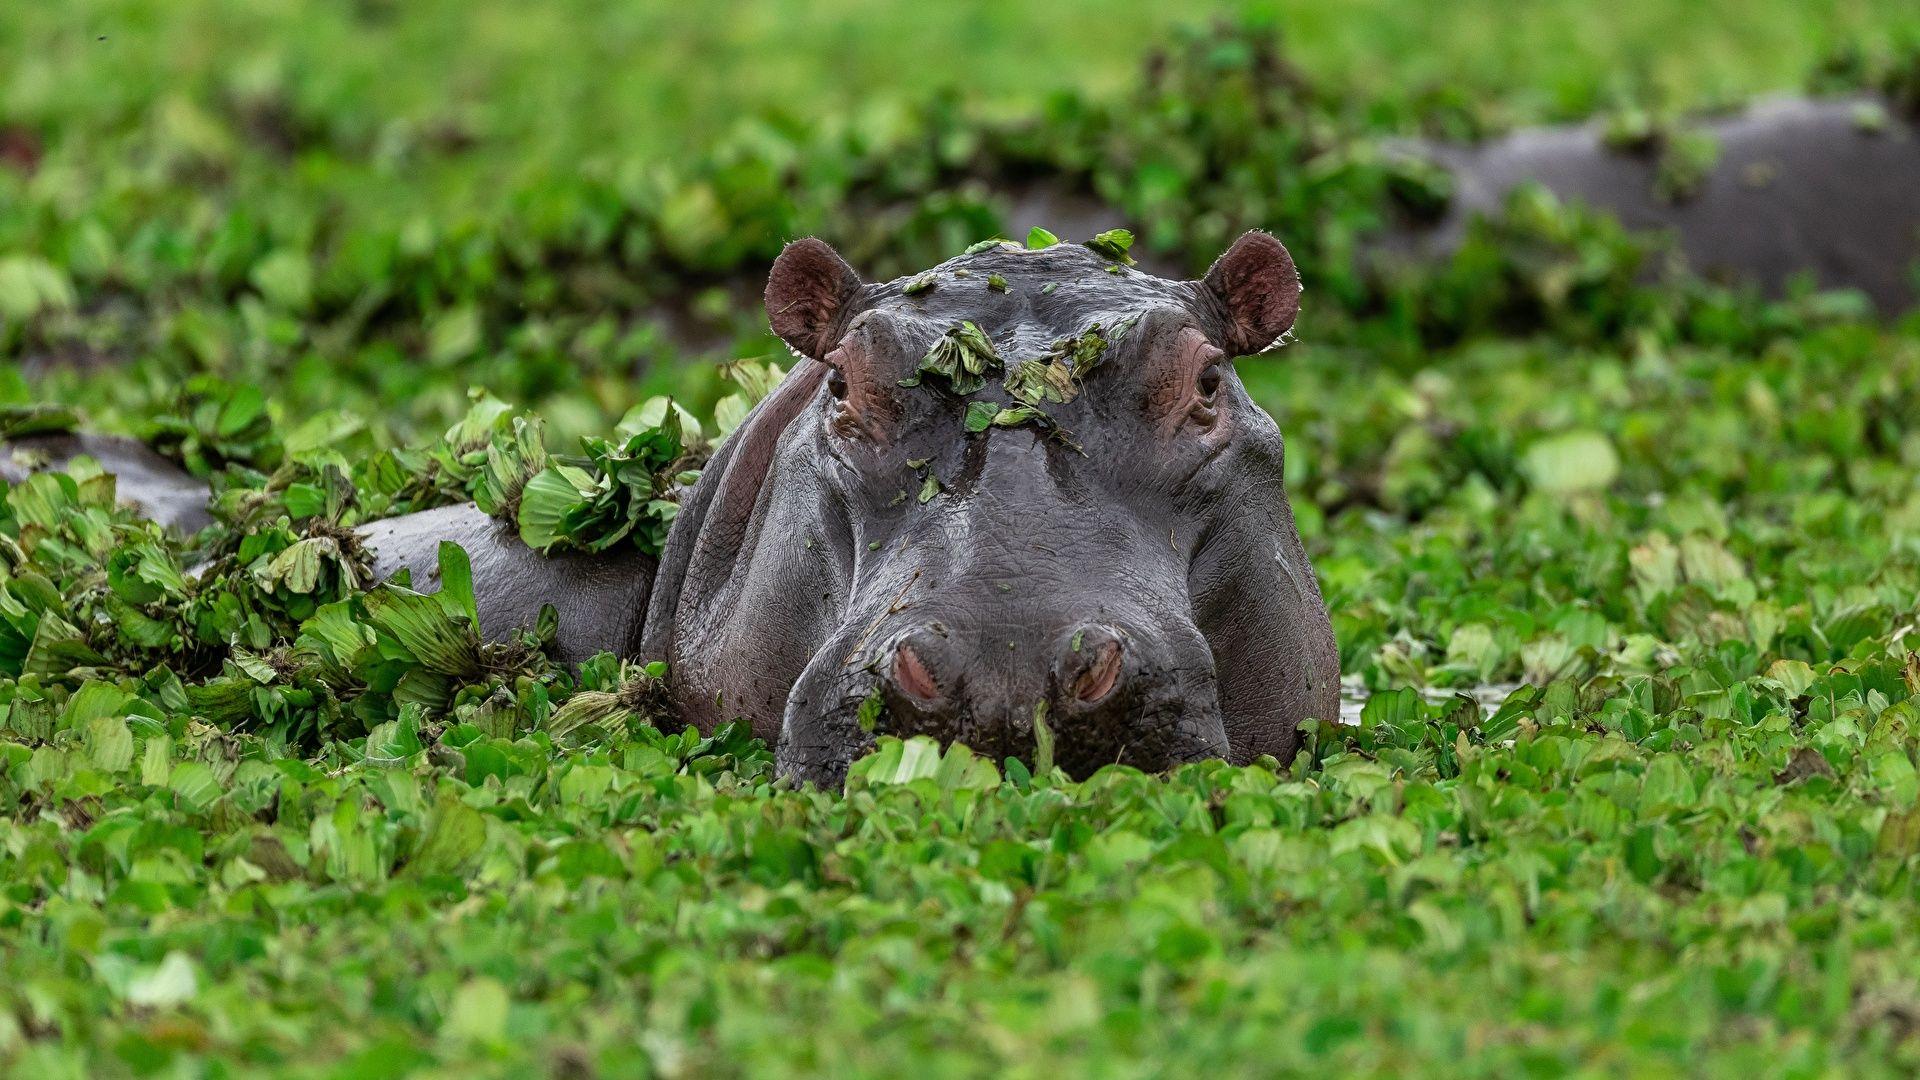 The Hippo Swamp